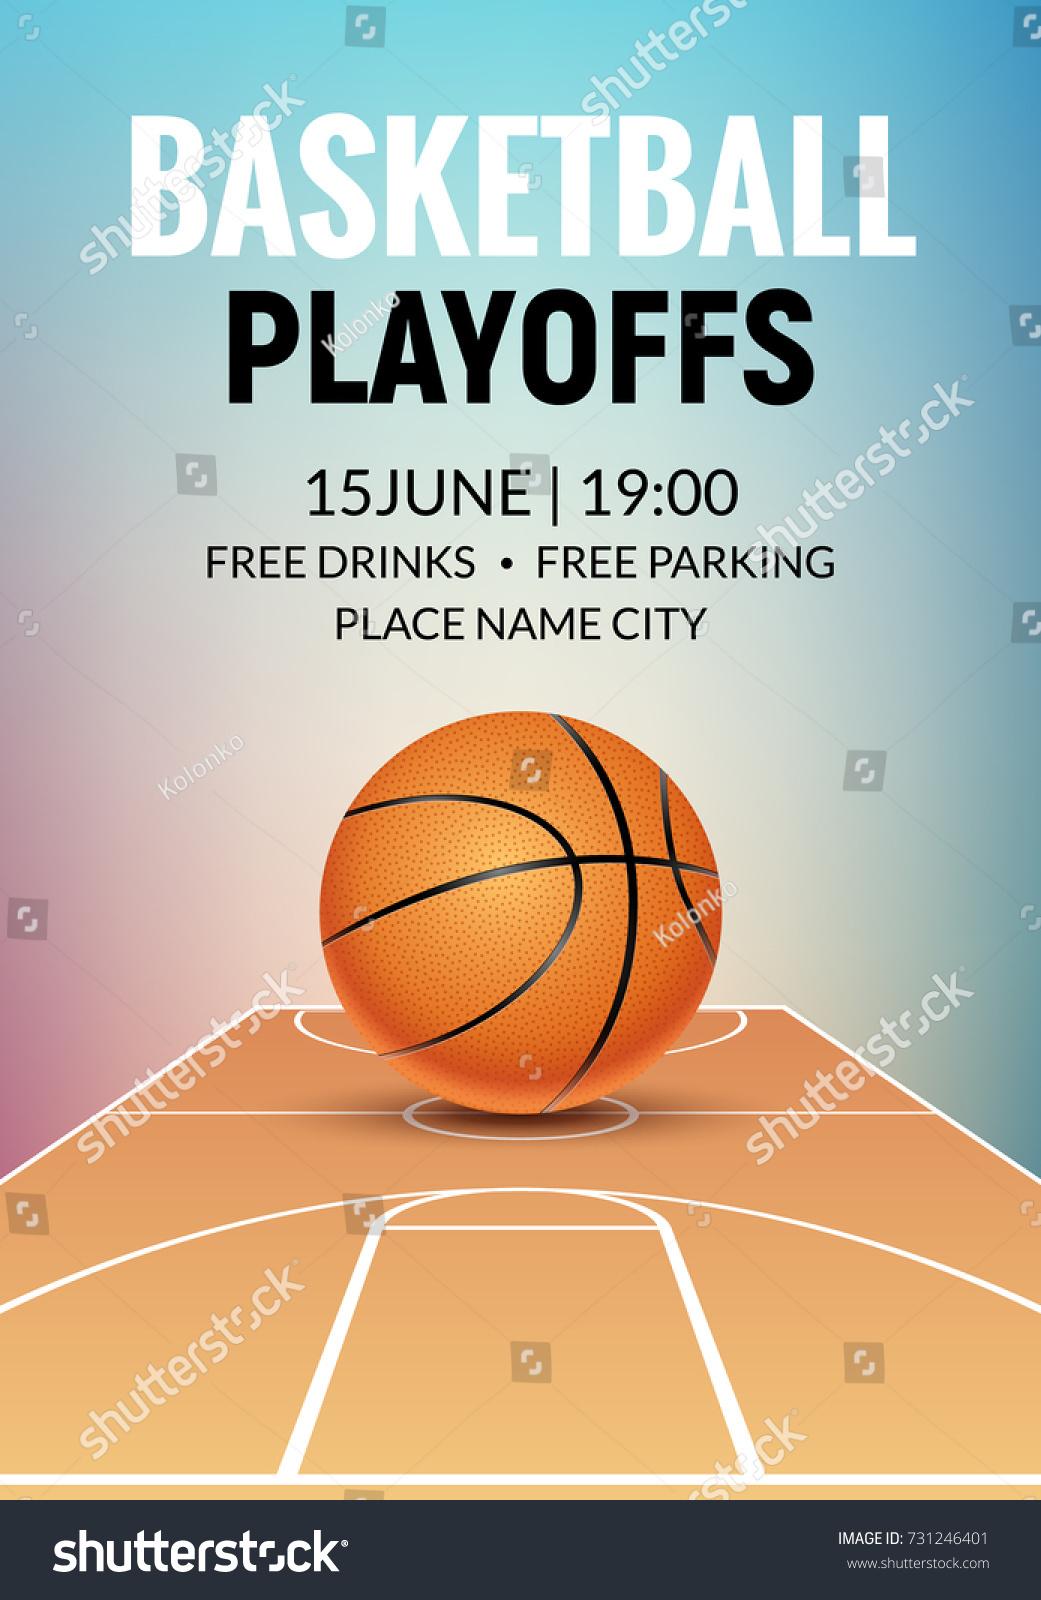 Basketball Vector Poster Game Tournament. Realistic Basketball Flyer Design.